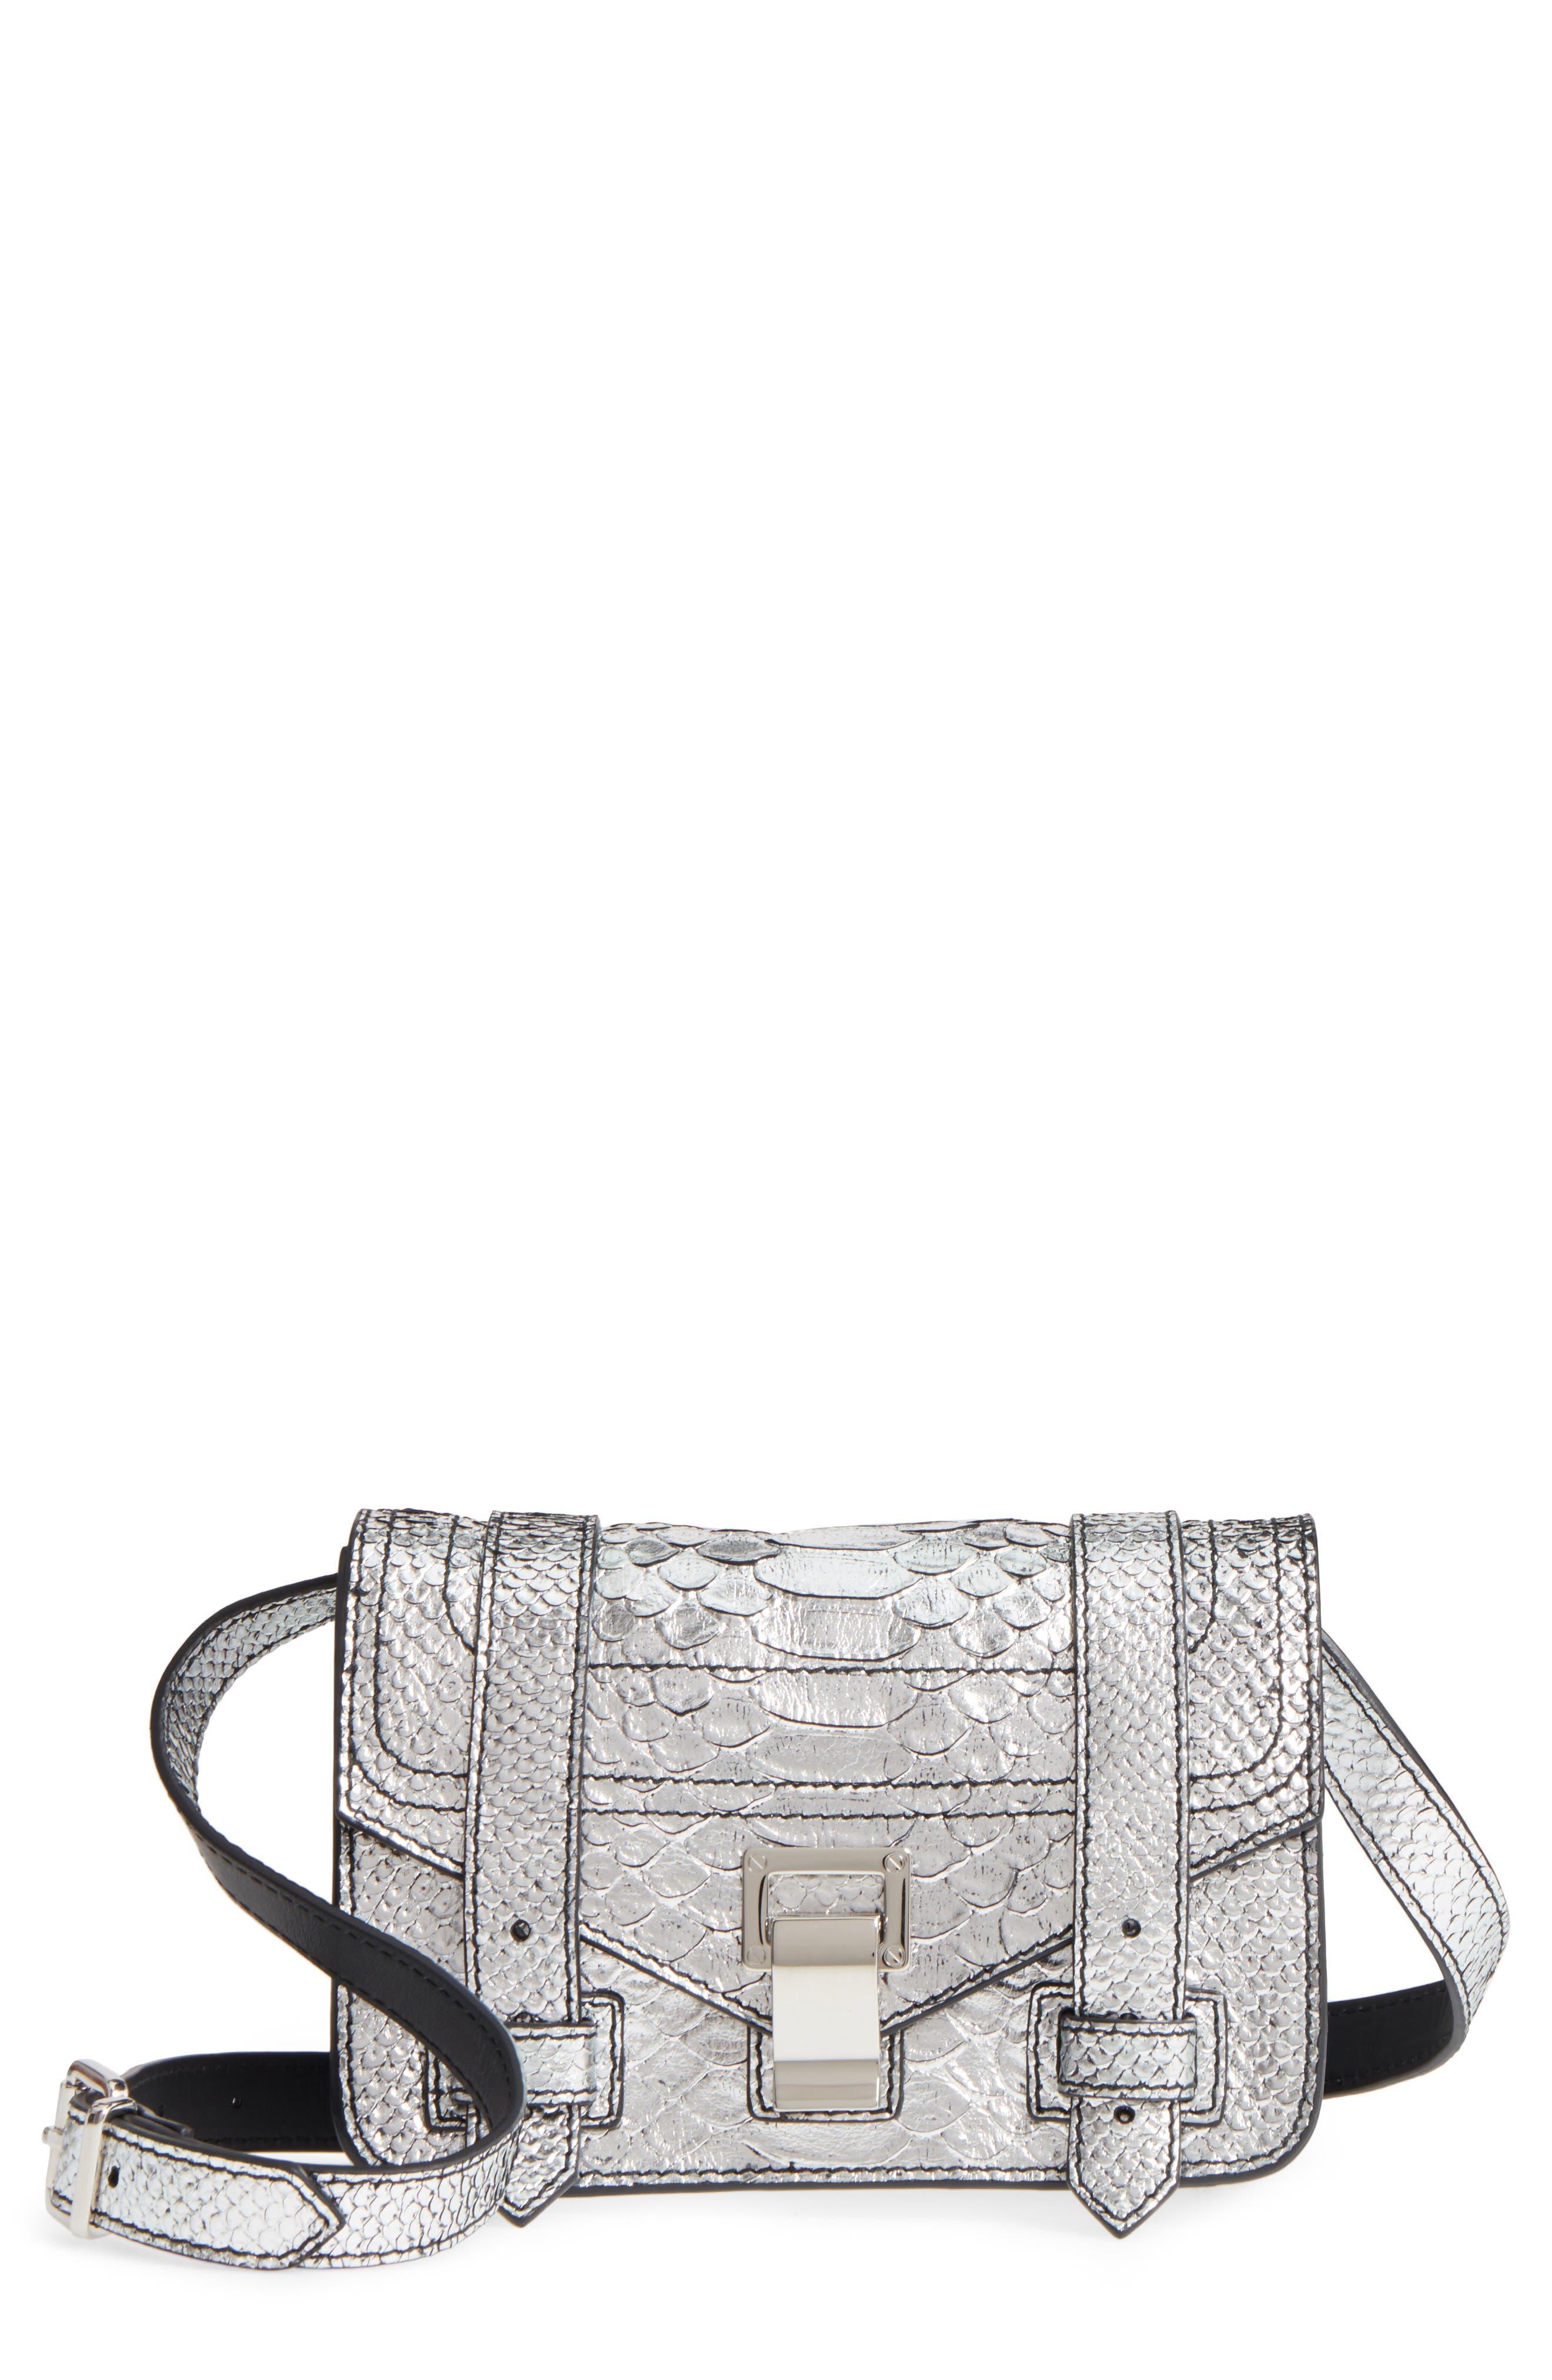 Alternate Image 1 Selected - Proenza Schouler Mini PS1 Snakeskin Embossed Metallic Leather Crossbody Bag